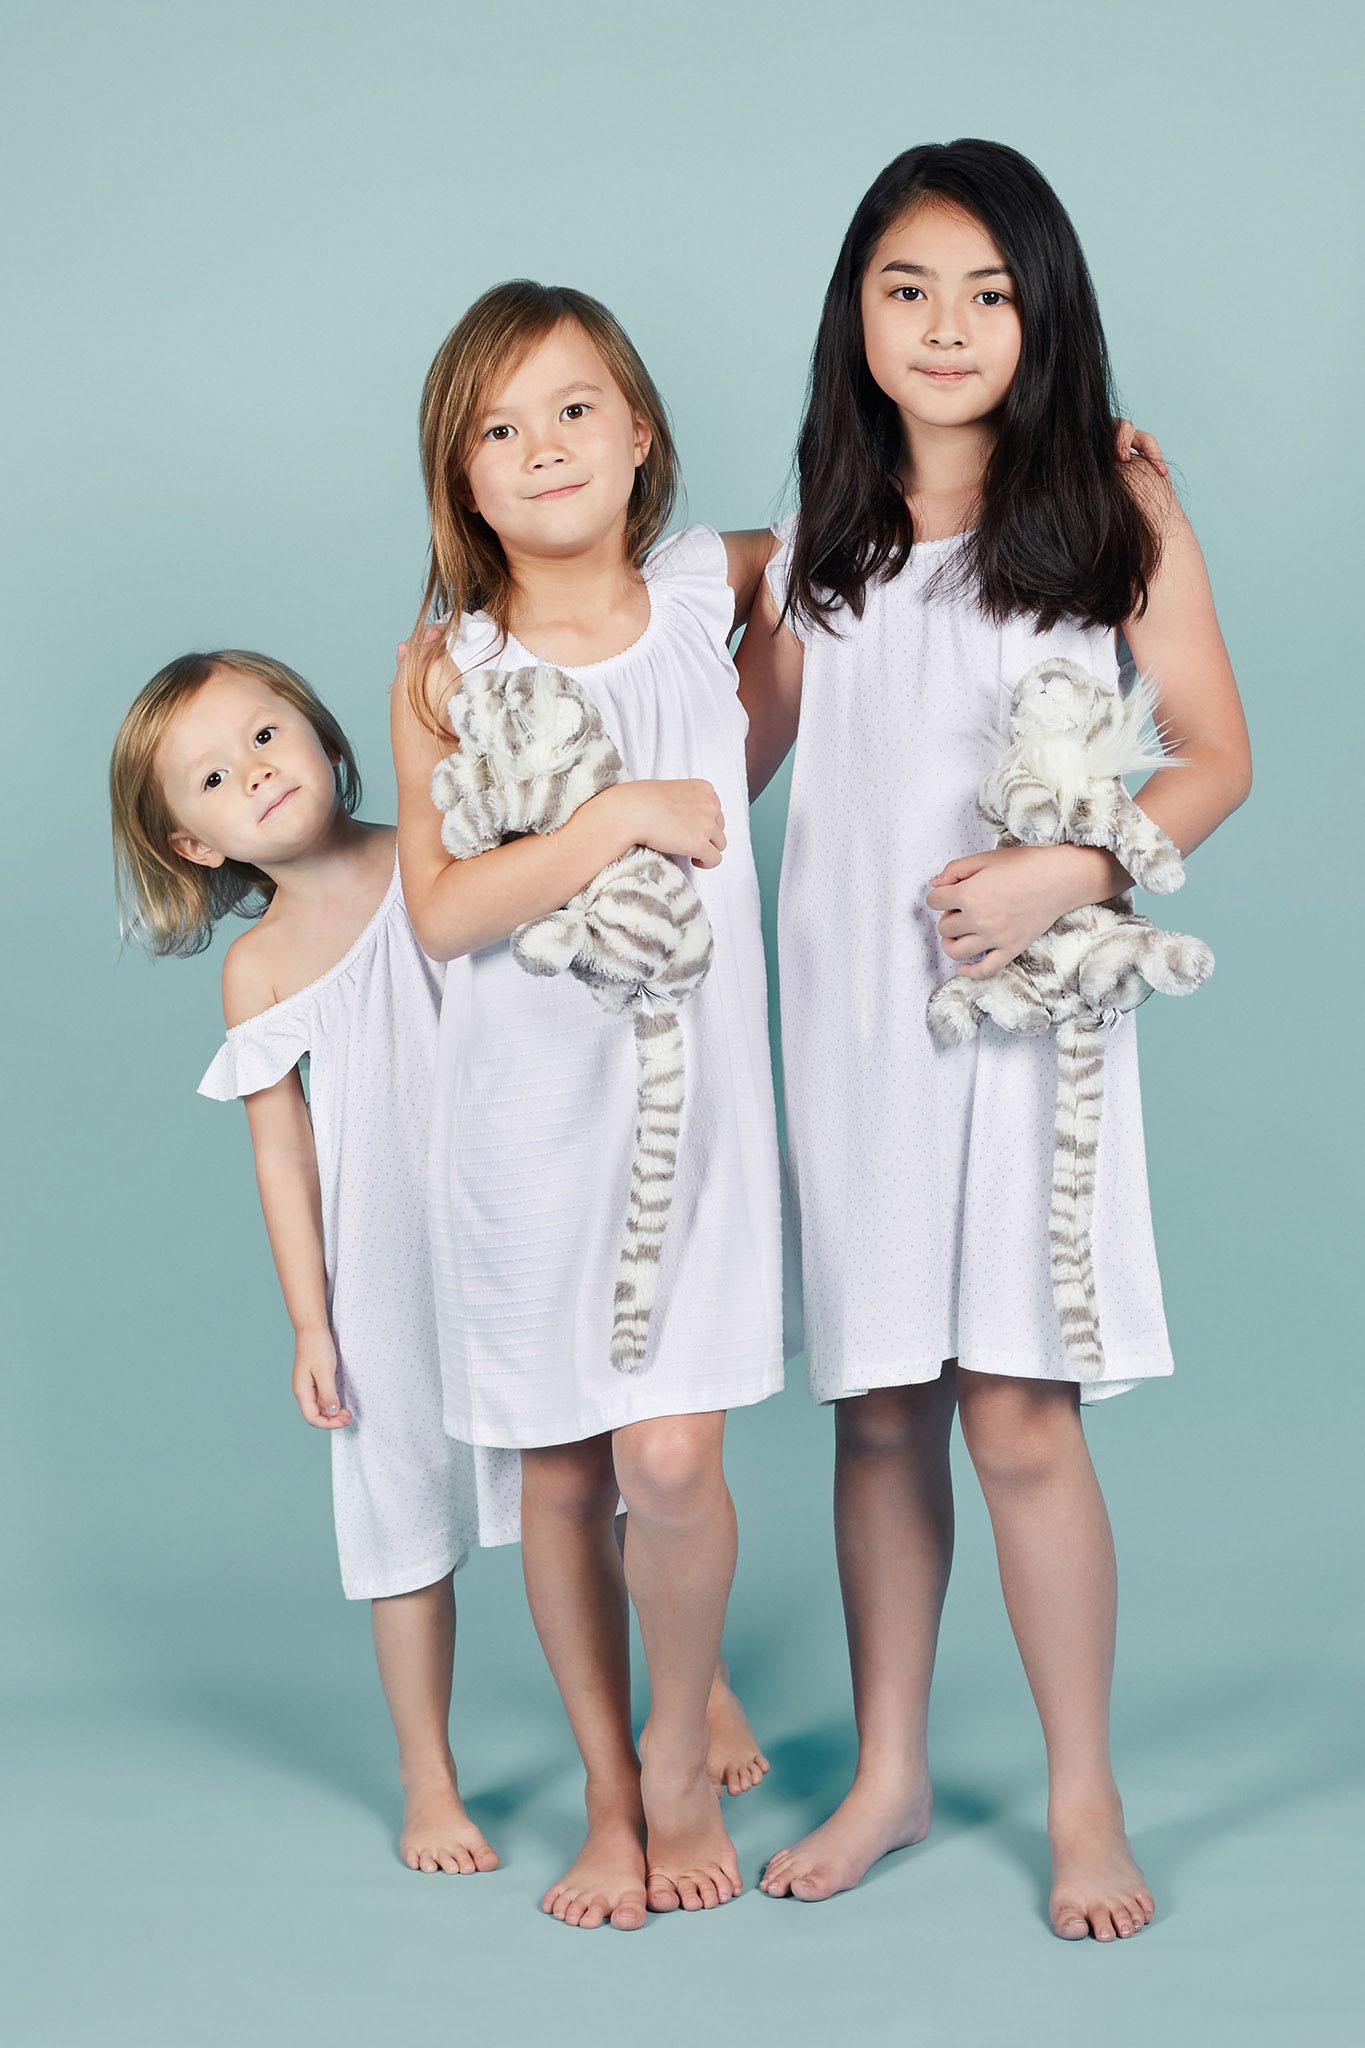 kids-studio-photography-the-jersey-shop-2